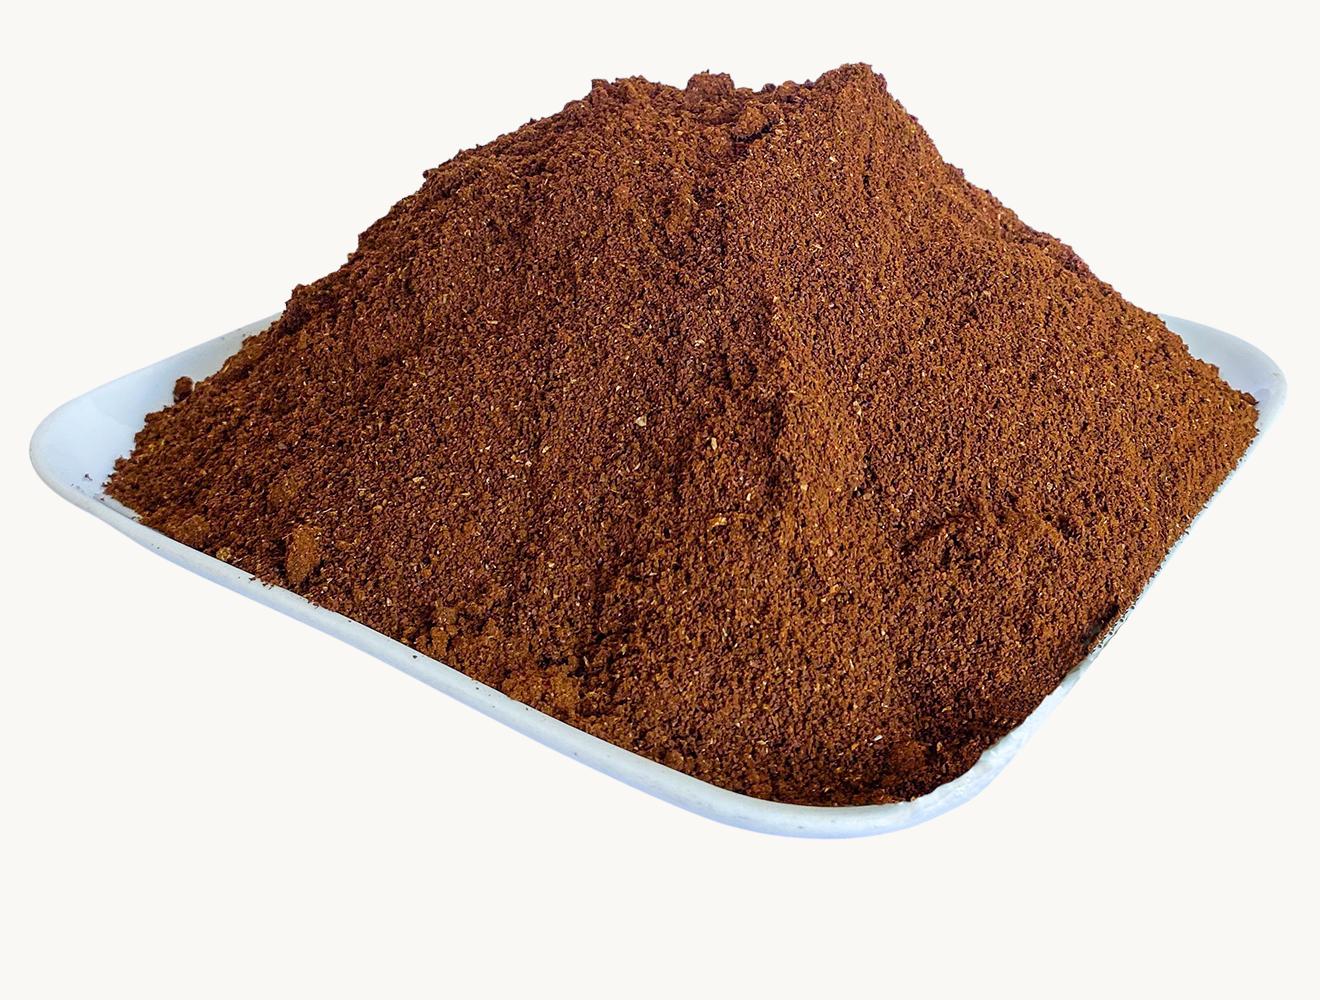 Hausmischung 100% Arabica Kaffee gemahlen